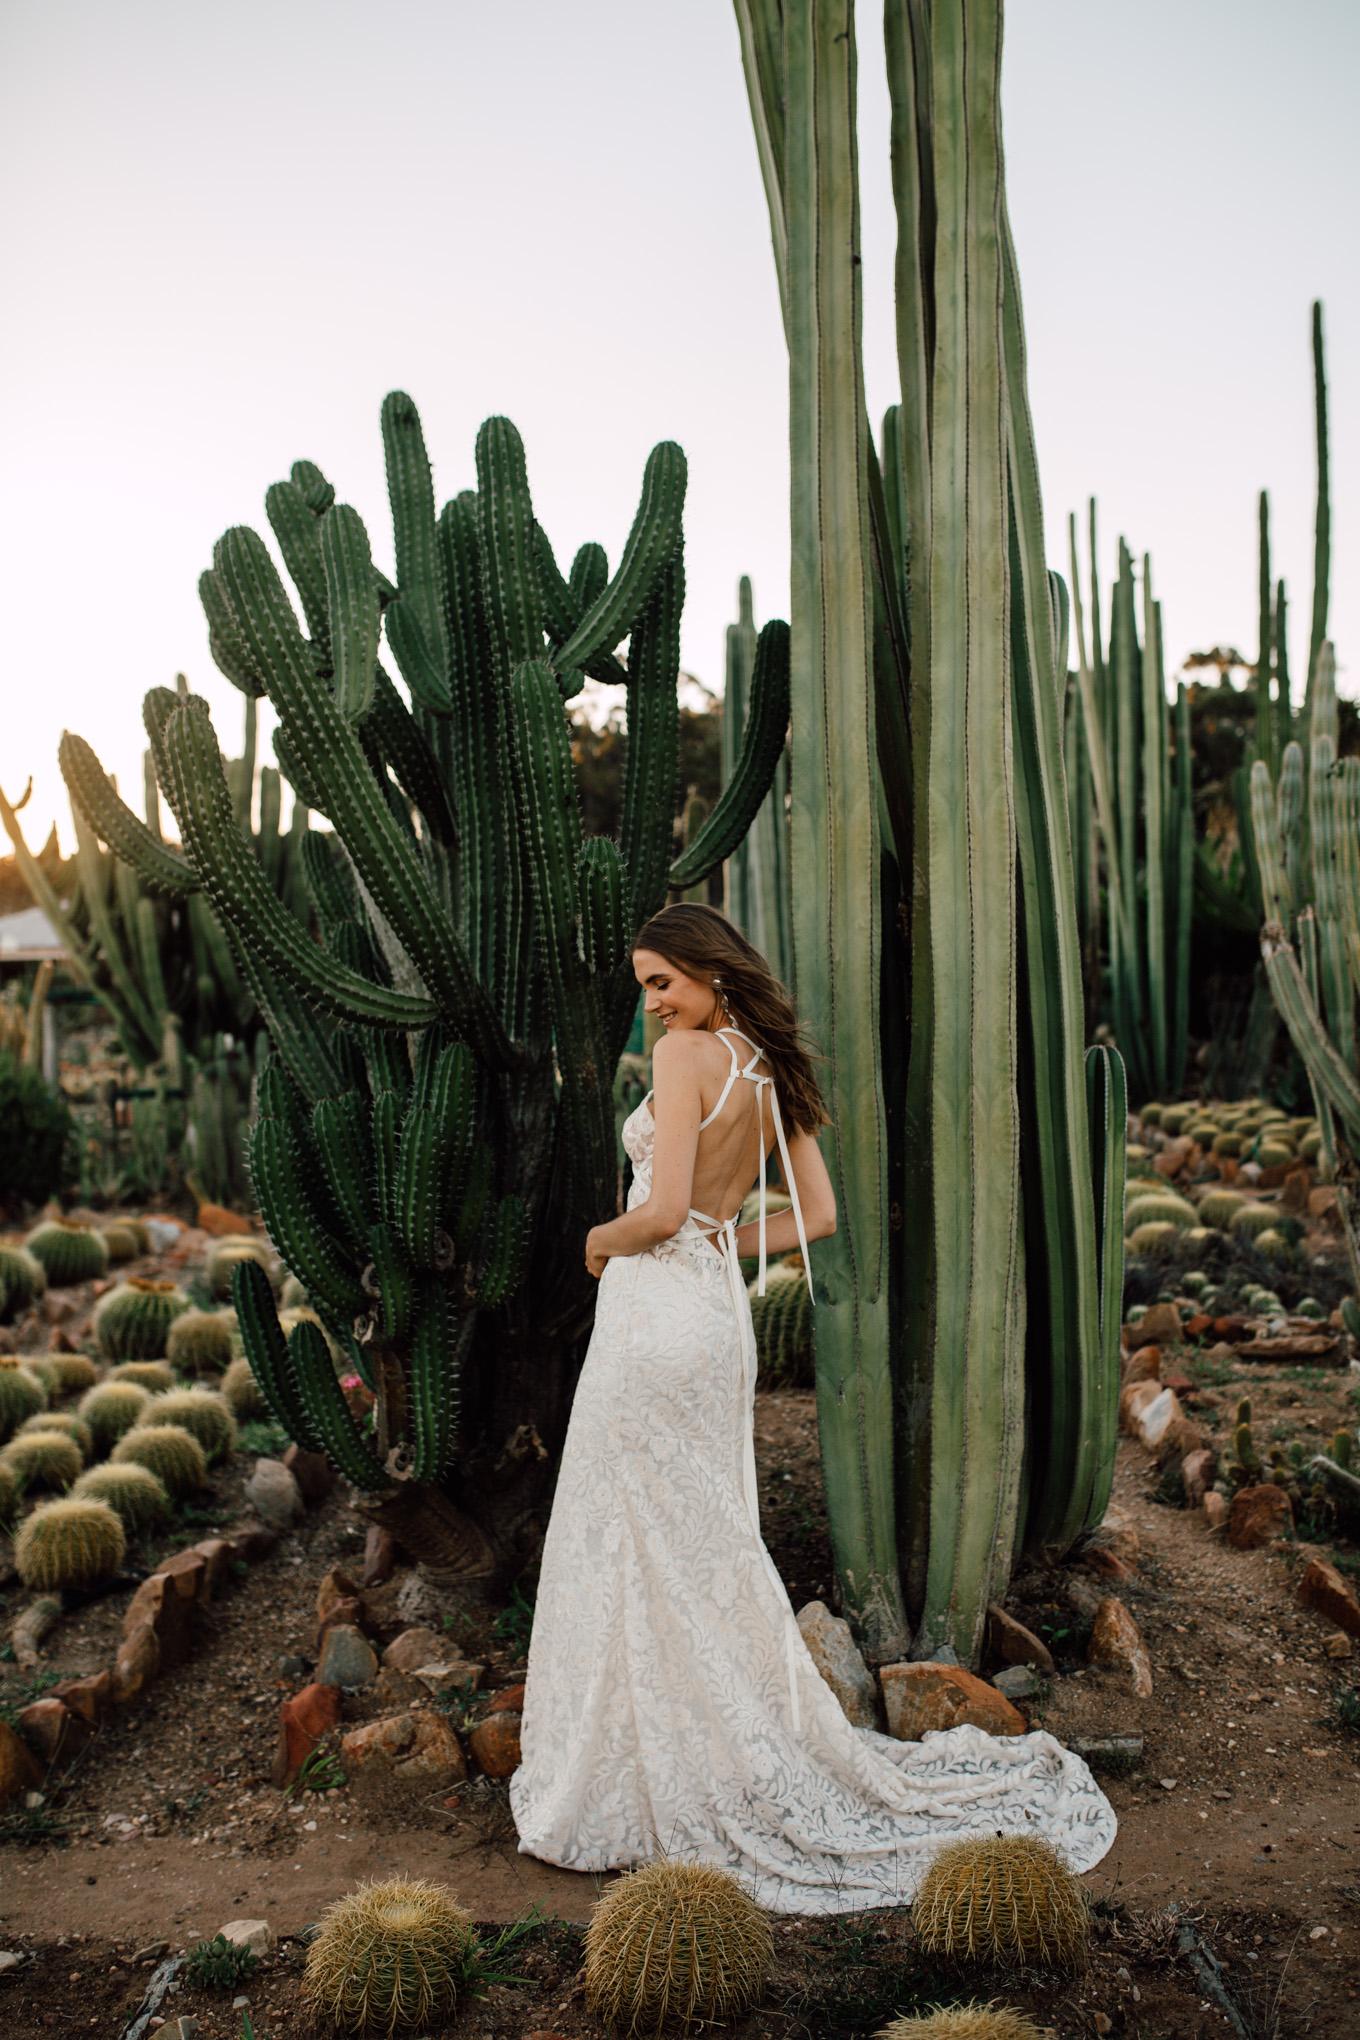 Cape-Town-Pia-Anna-Christian-Wedding-Photography-South-Africa-Bride-Cactus-9.jpg